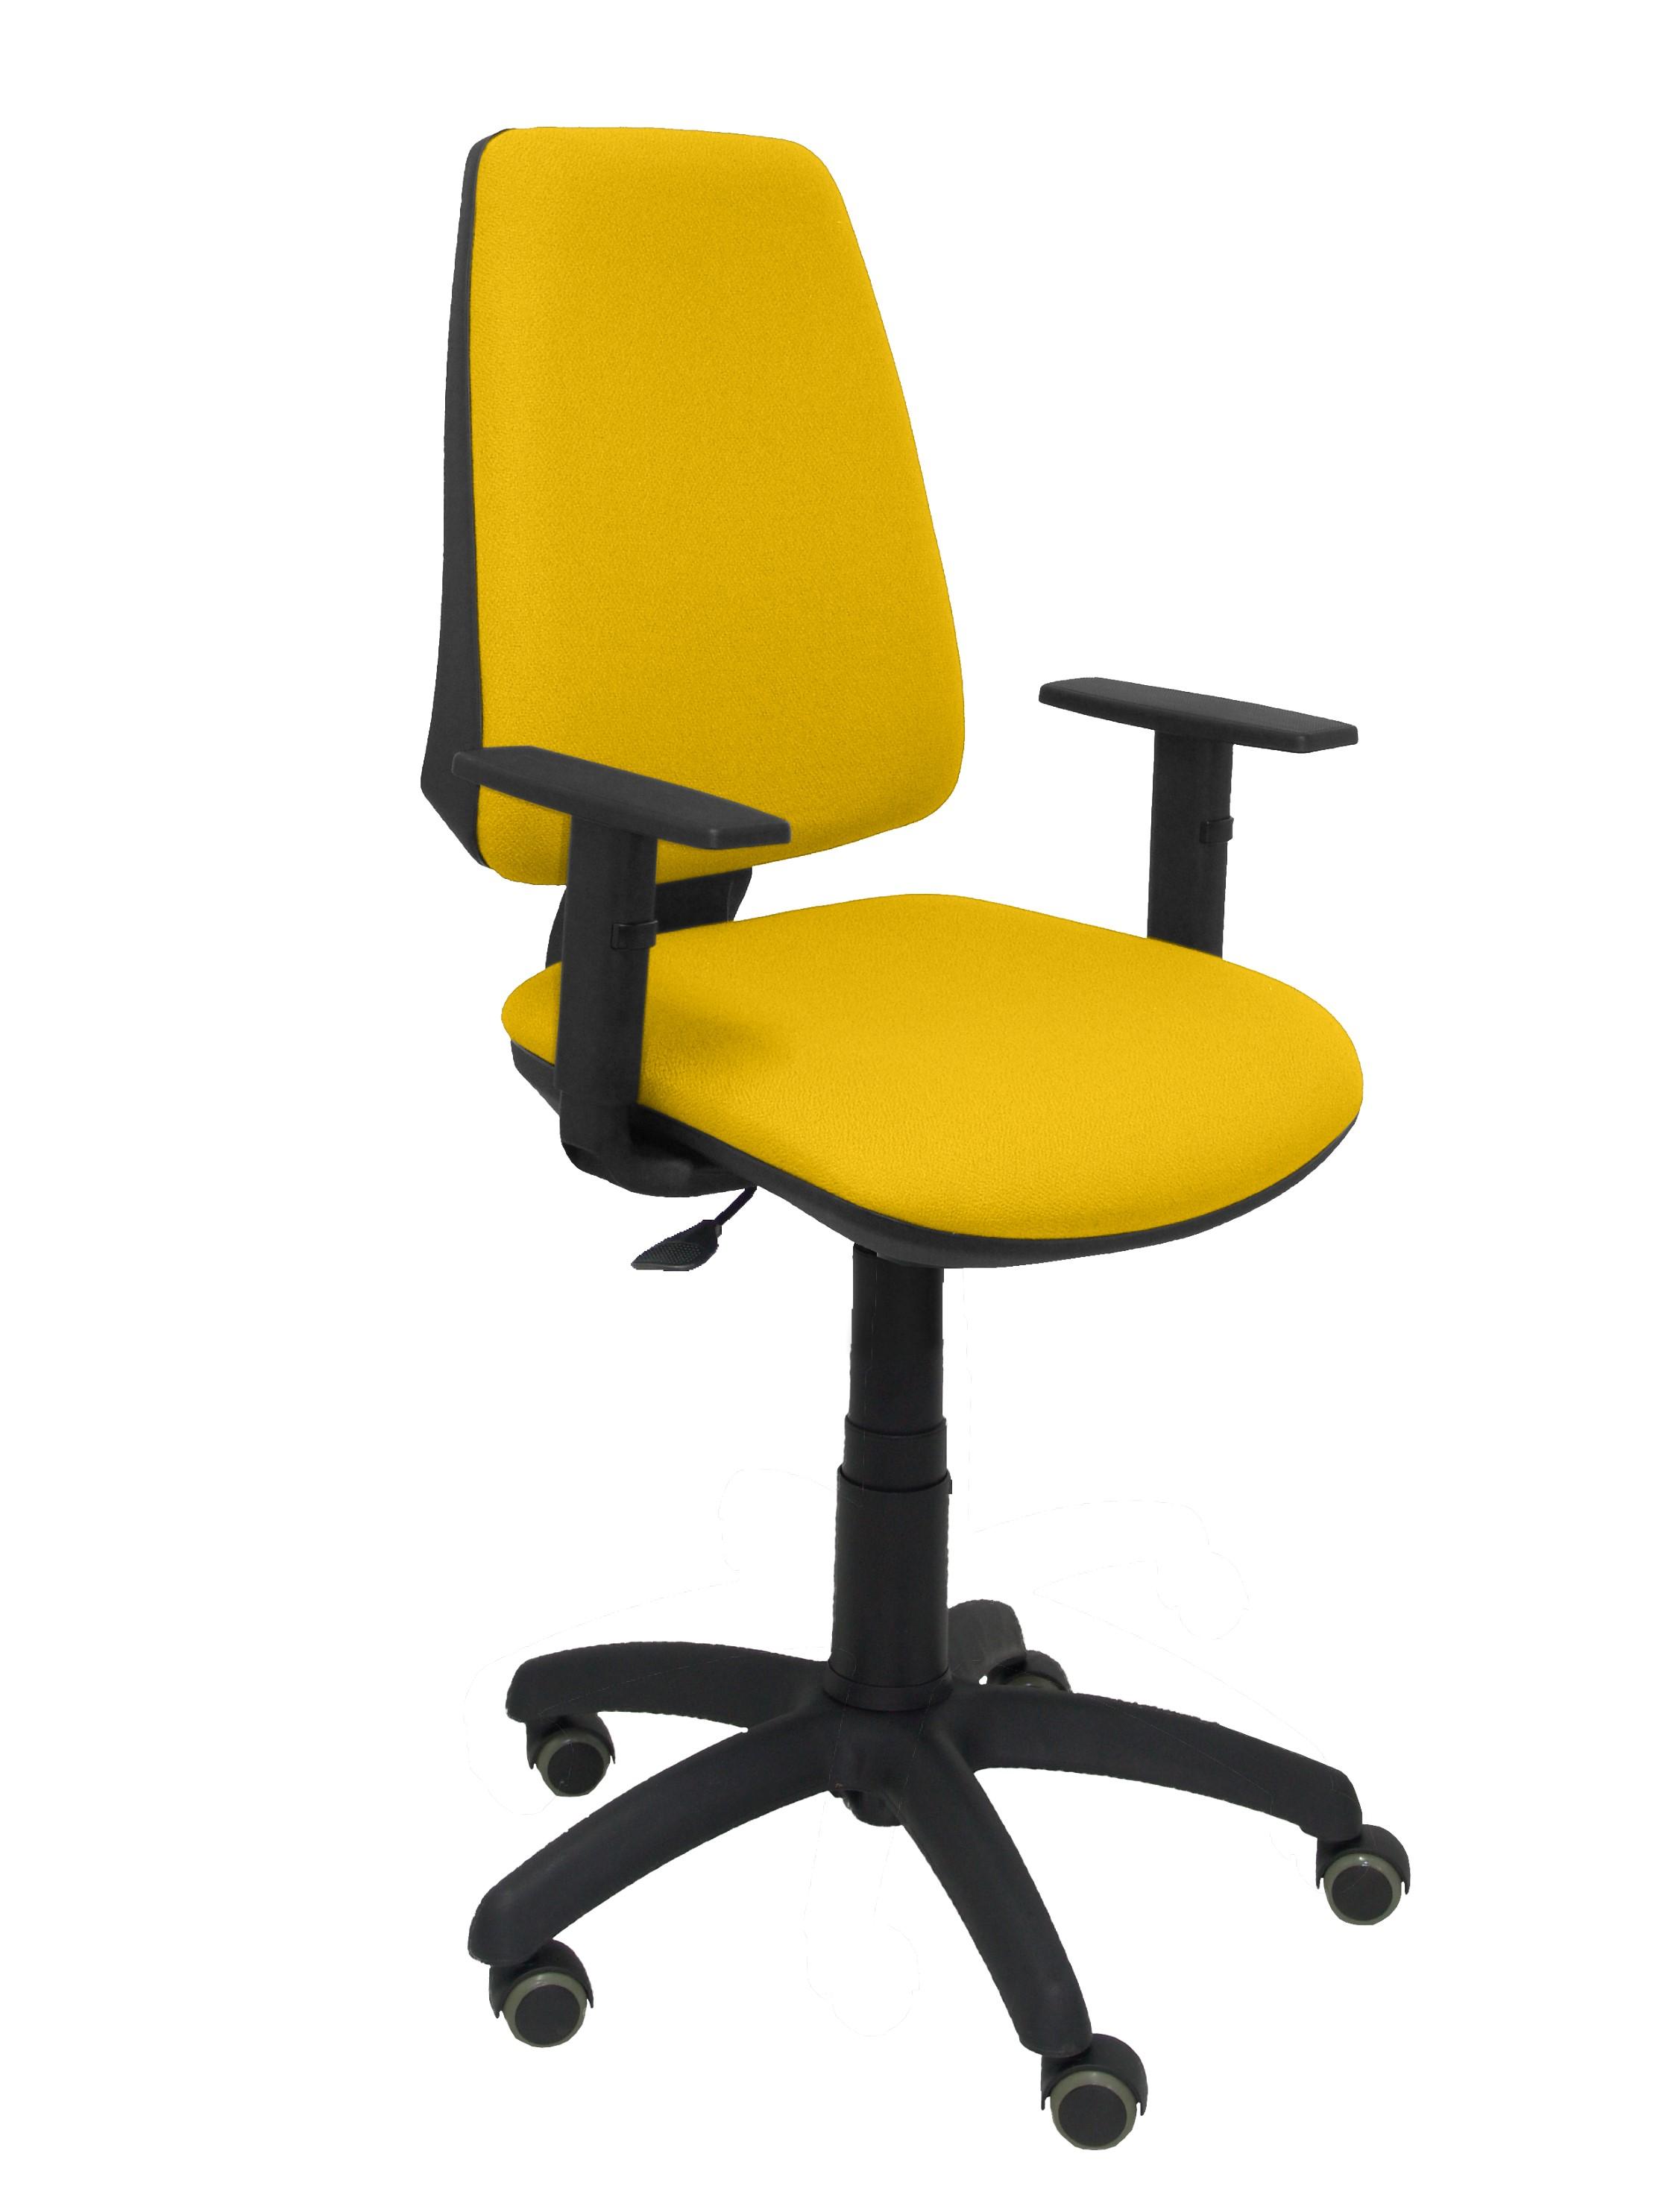 Silla Elche CP bali amarillo brazos regulables ruedas de parquet